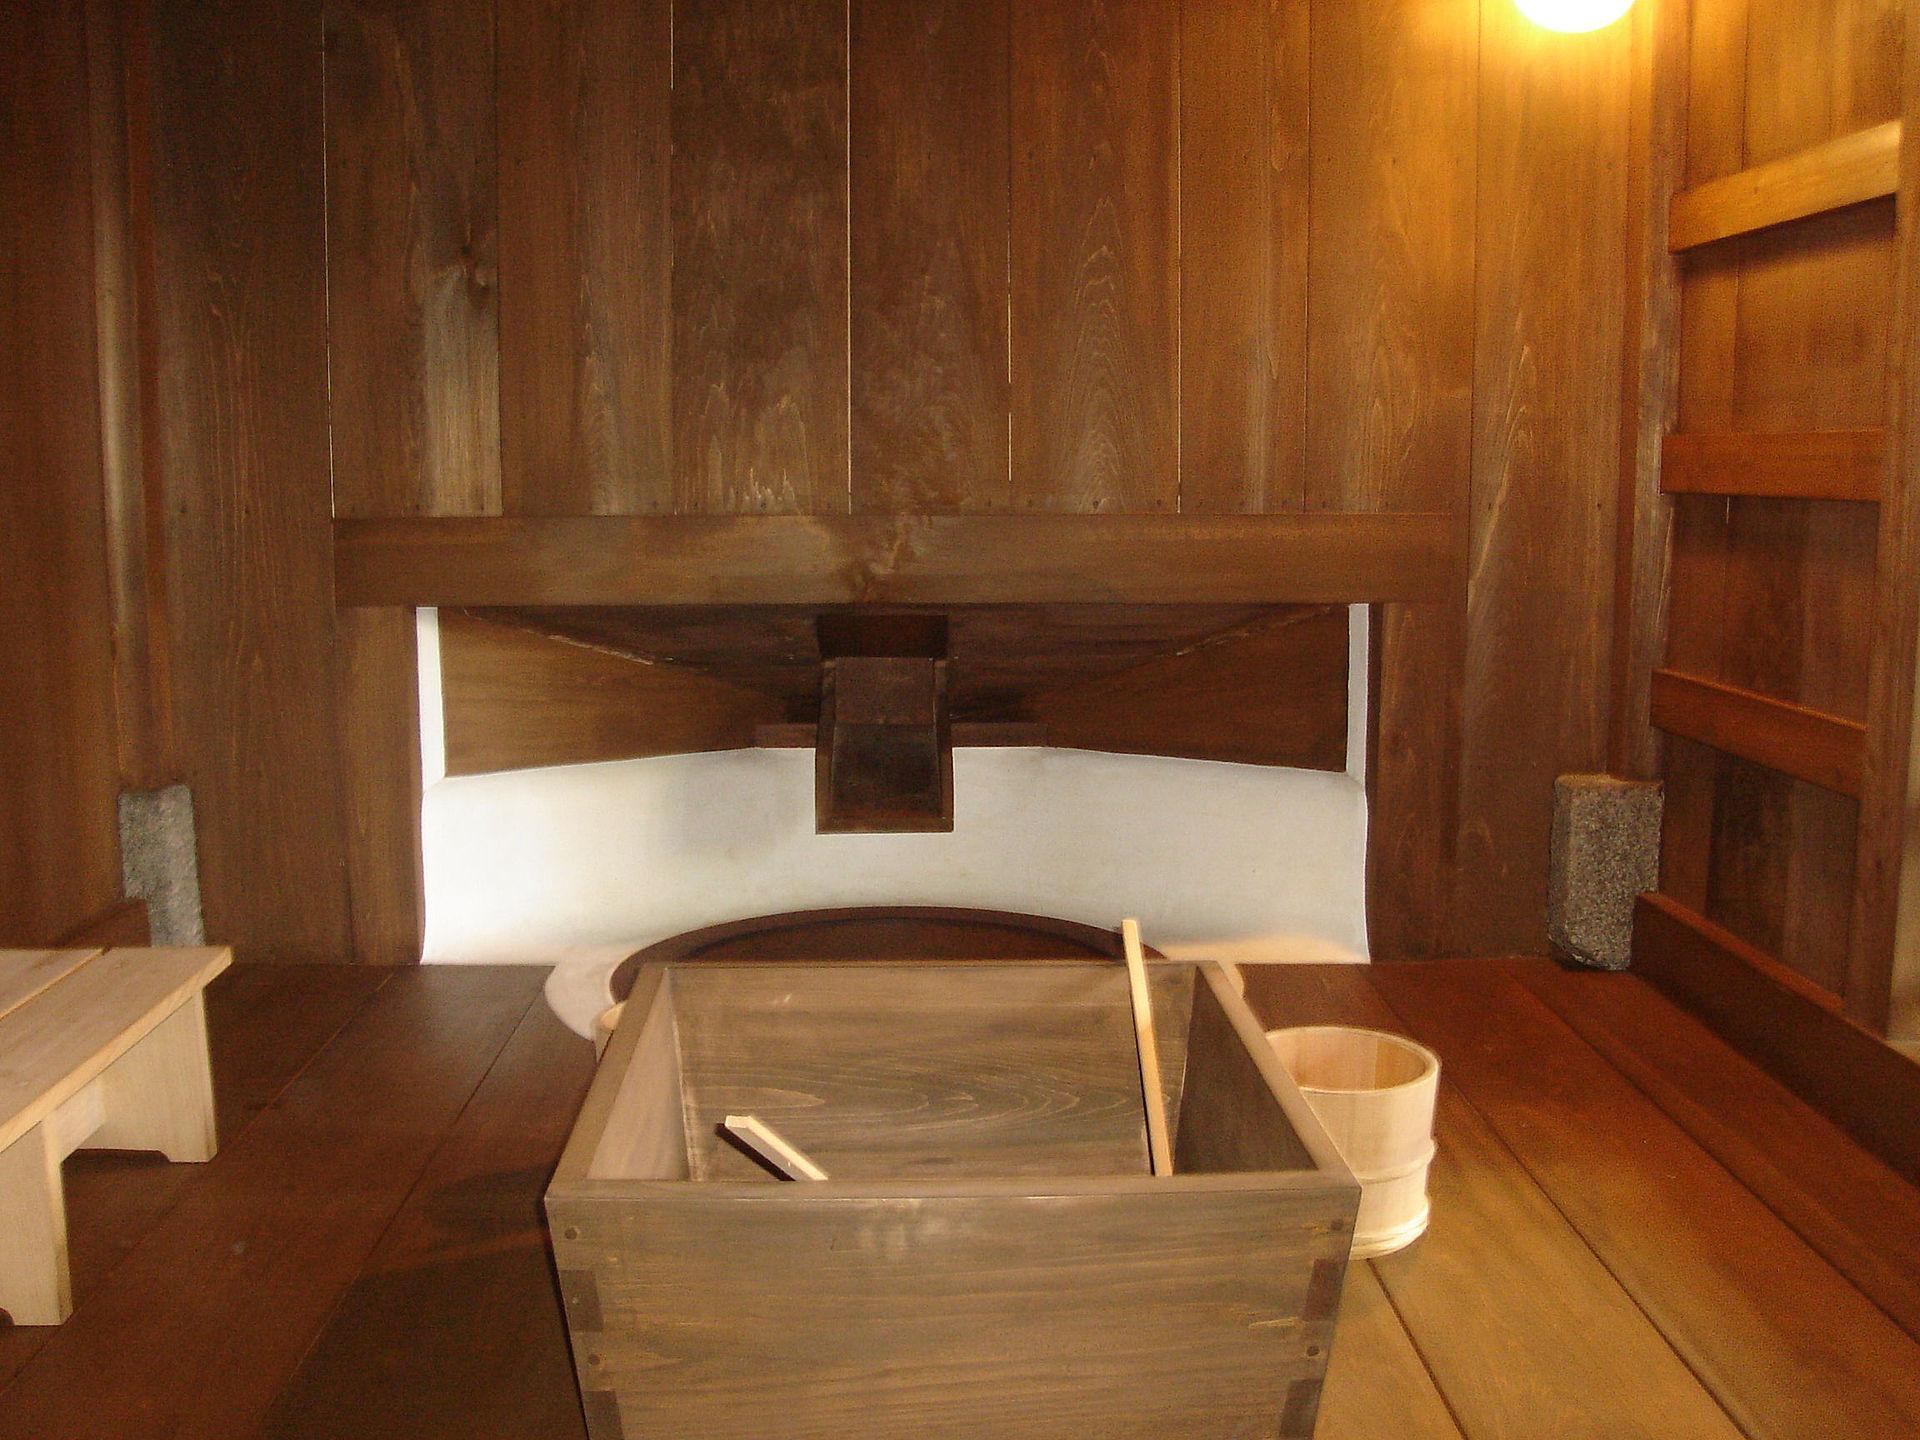 Inspirational Freestanding Cast Iron Tub Stock Of Bathtub Design